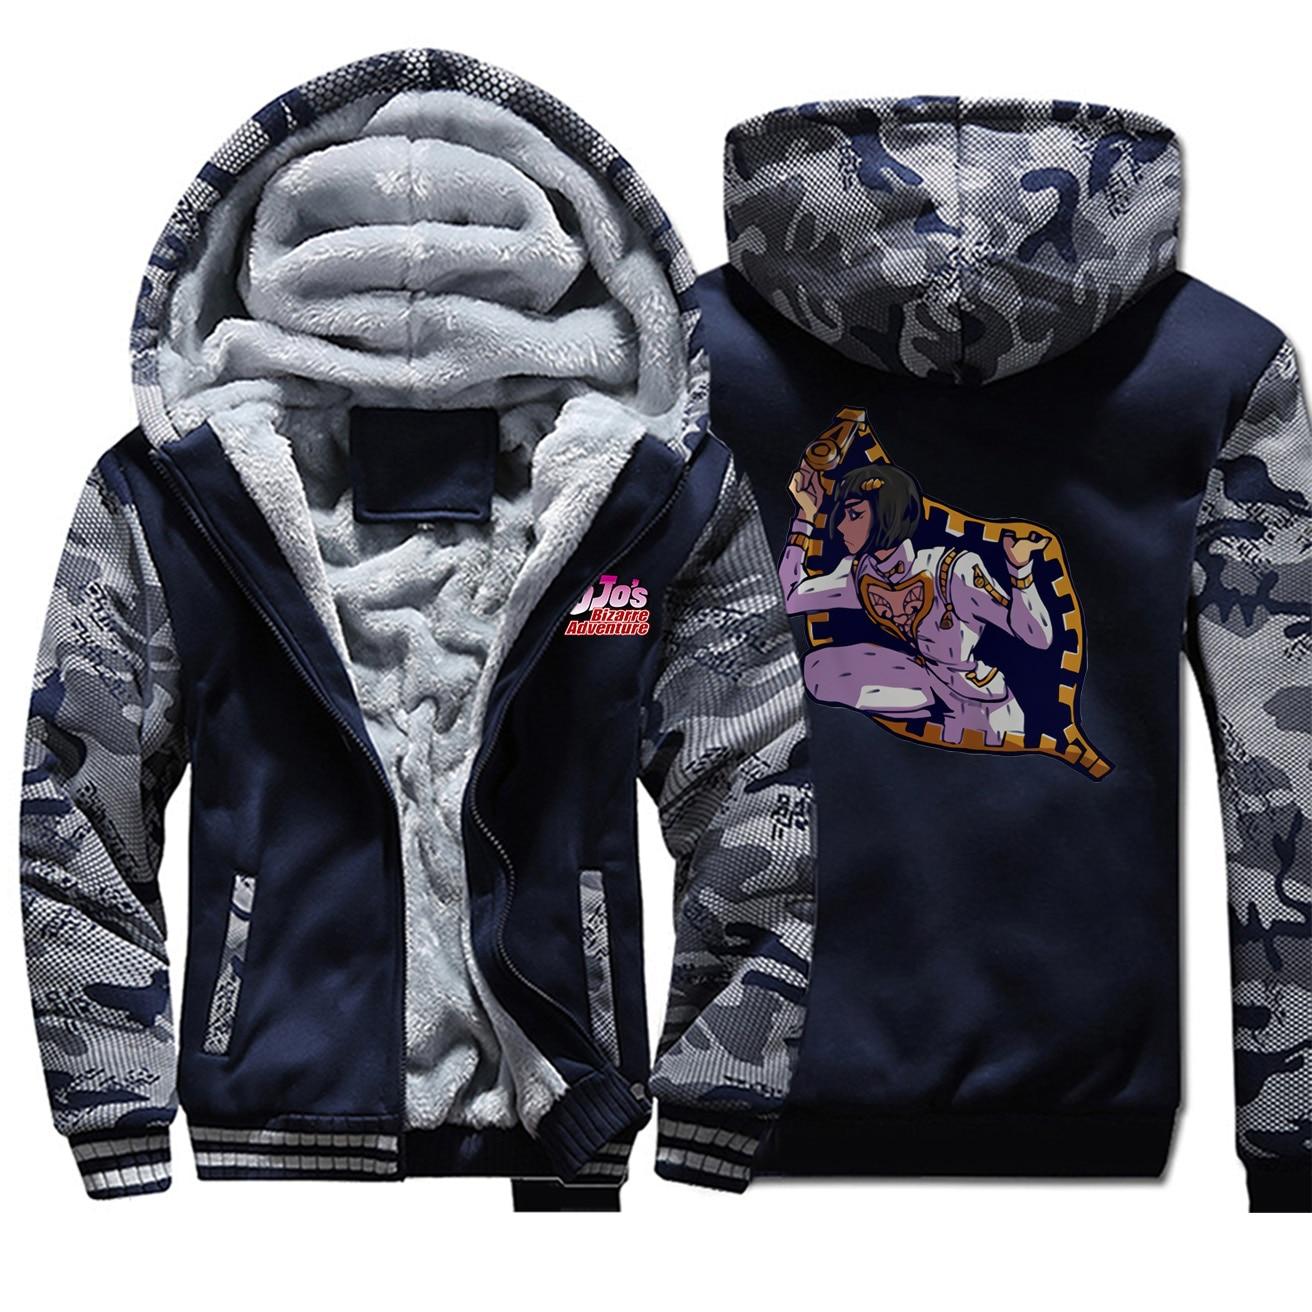 Zip Up Hoodie Adventure Waiting Hooded Sweatshirt for Men